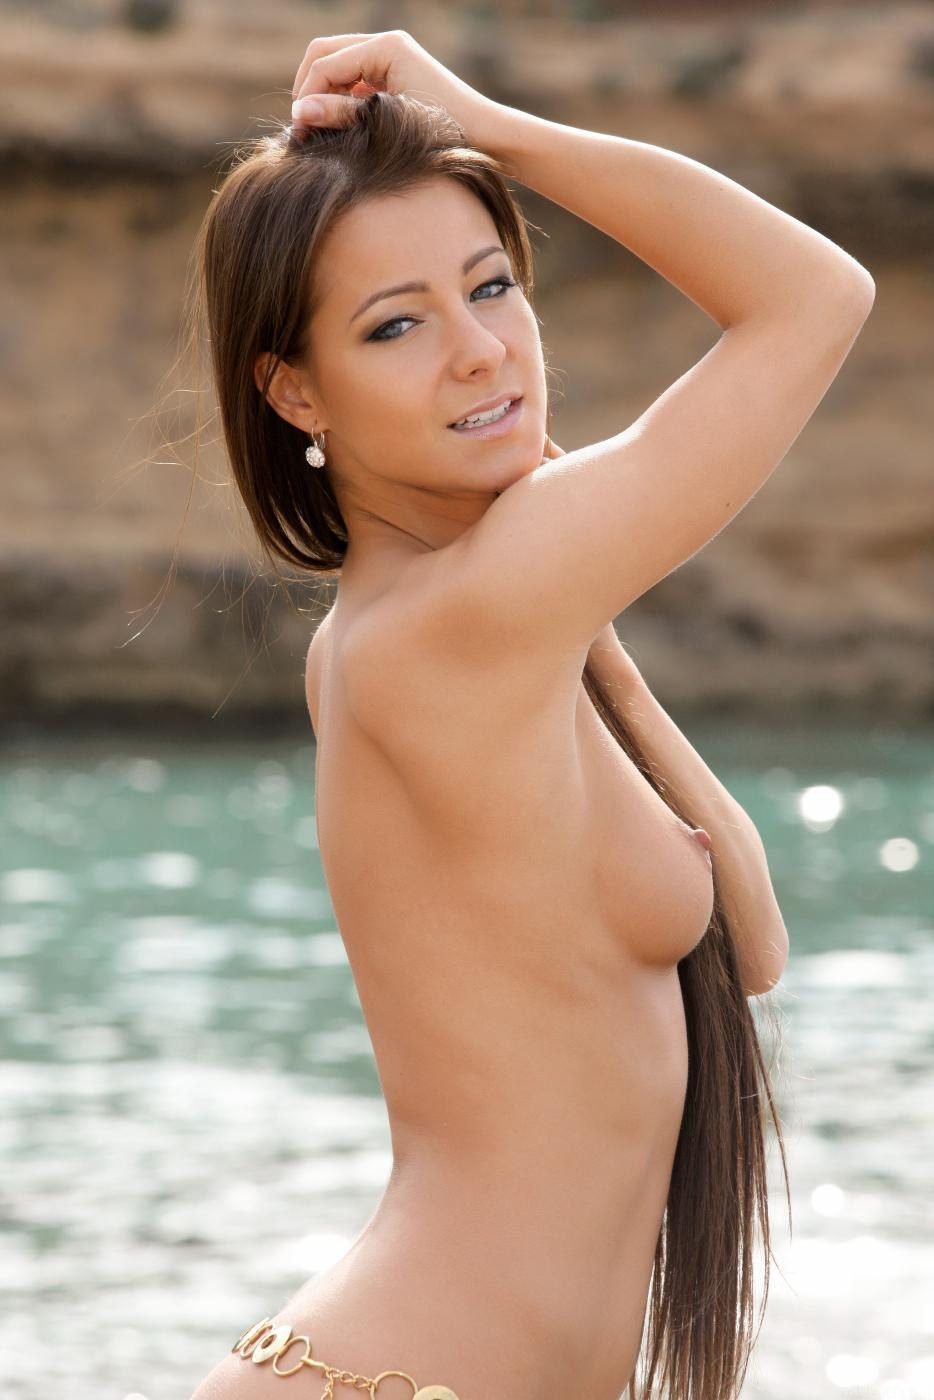 Подборка фото Most Erotic Teens - Melissa Mendiny